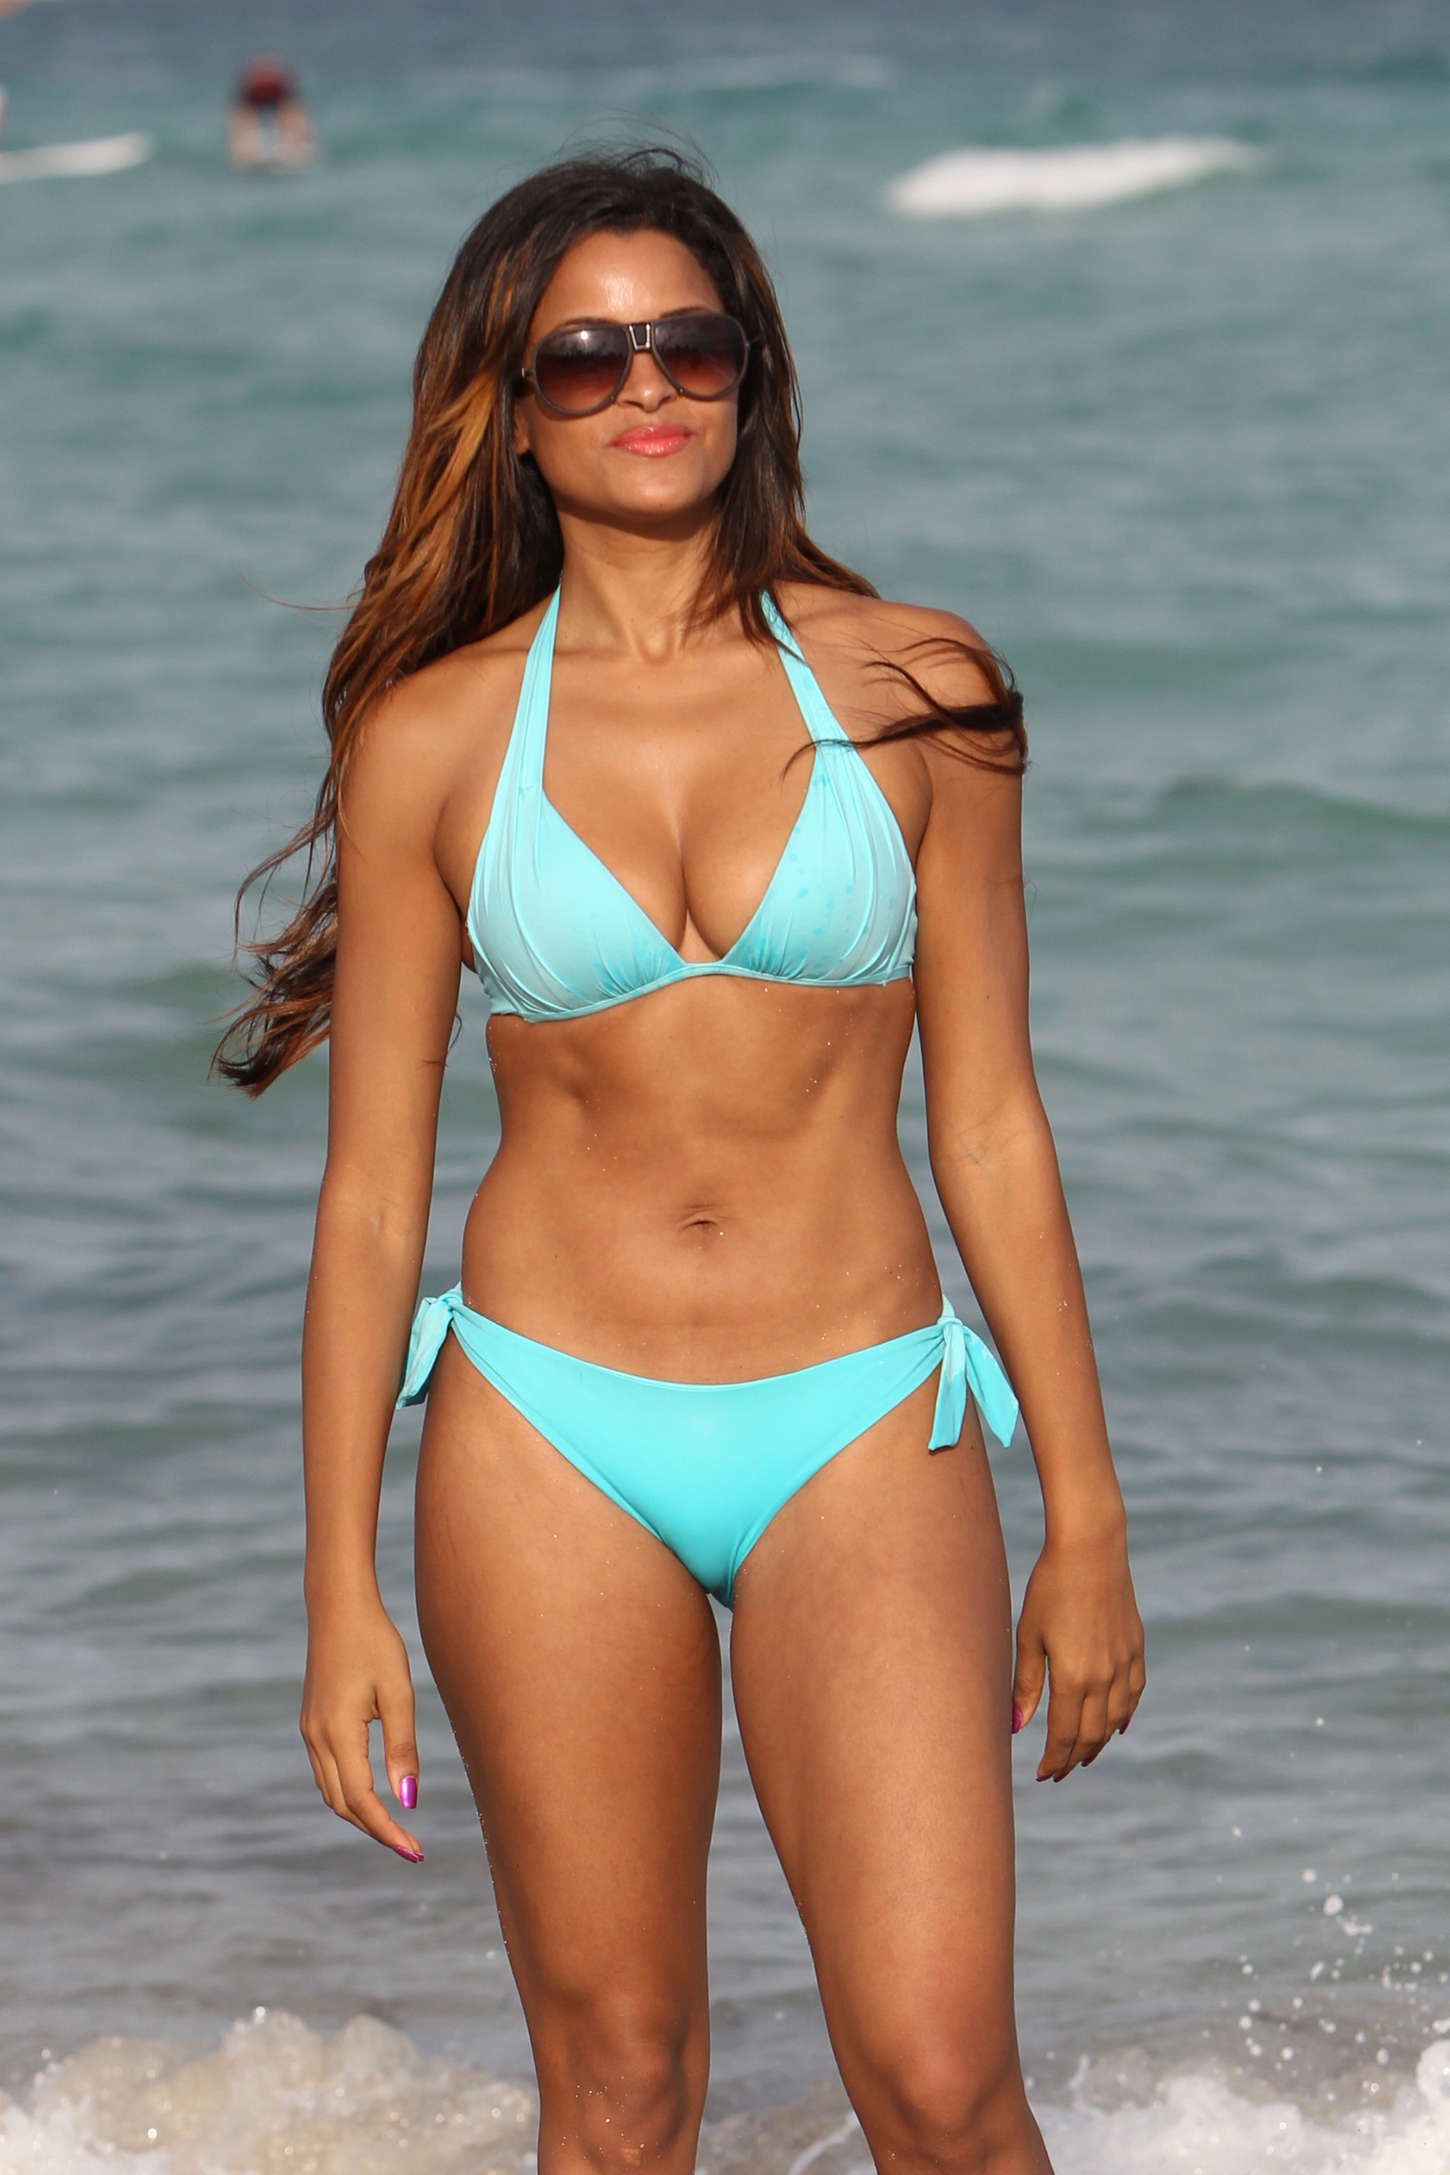 Celebrites Claudia Jordan nudes (21 photo), Topless, Bikini, Selfie, in bikini 2019